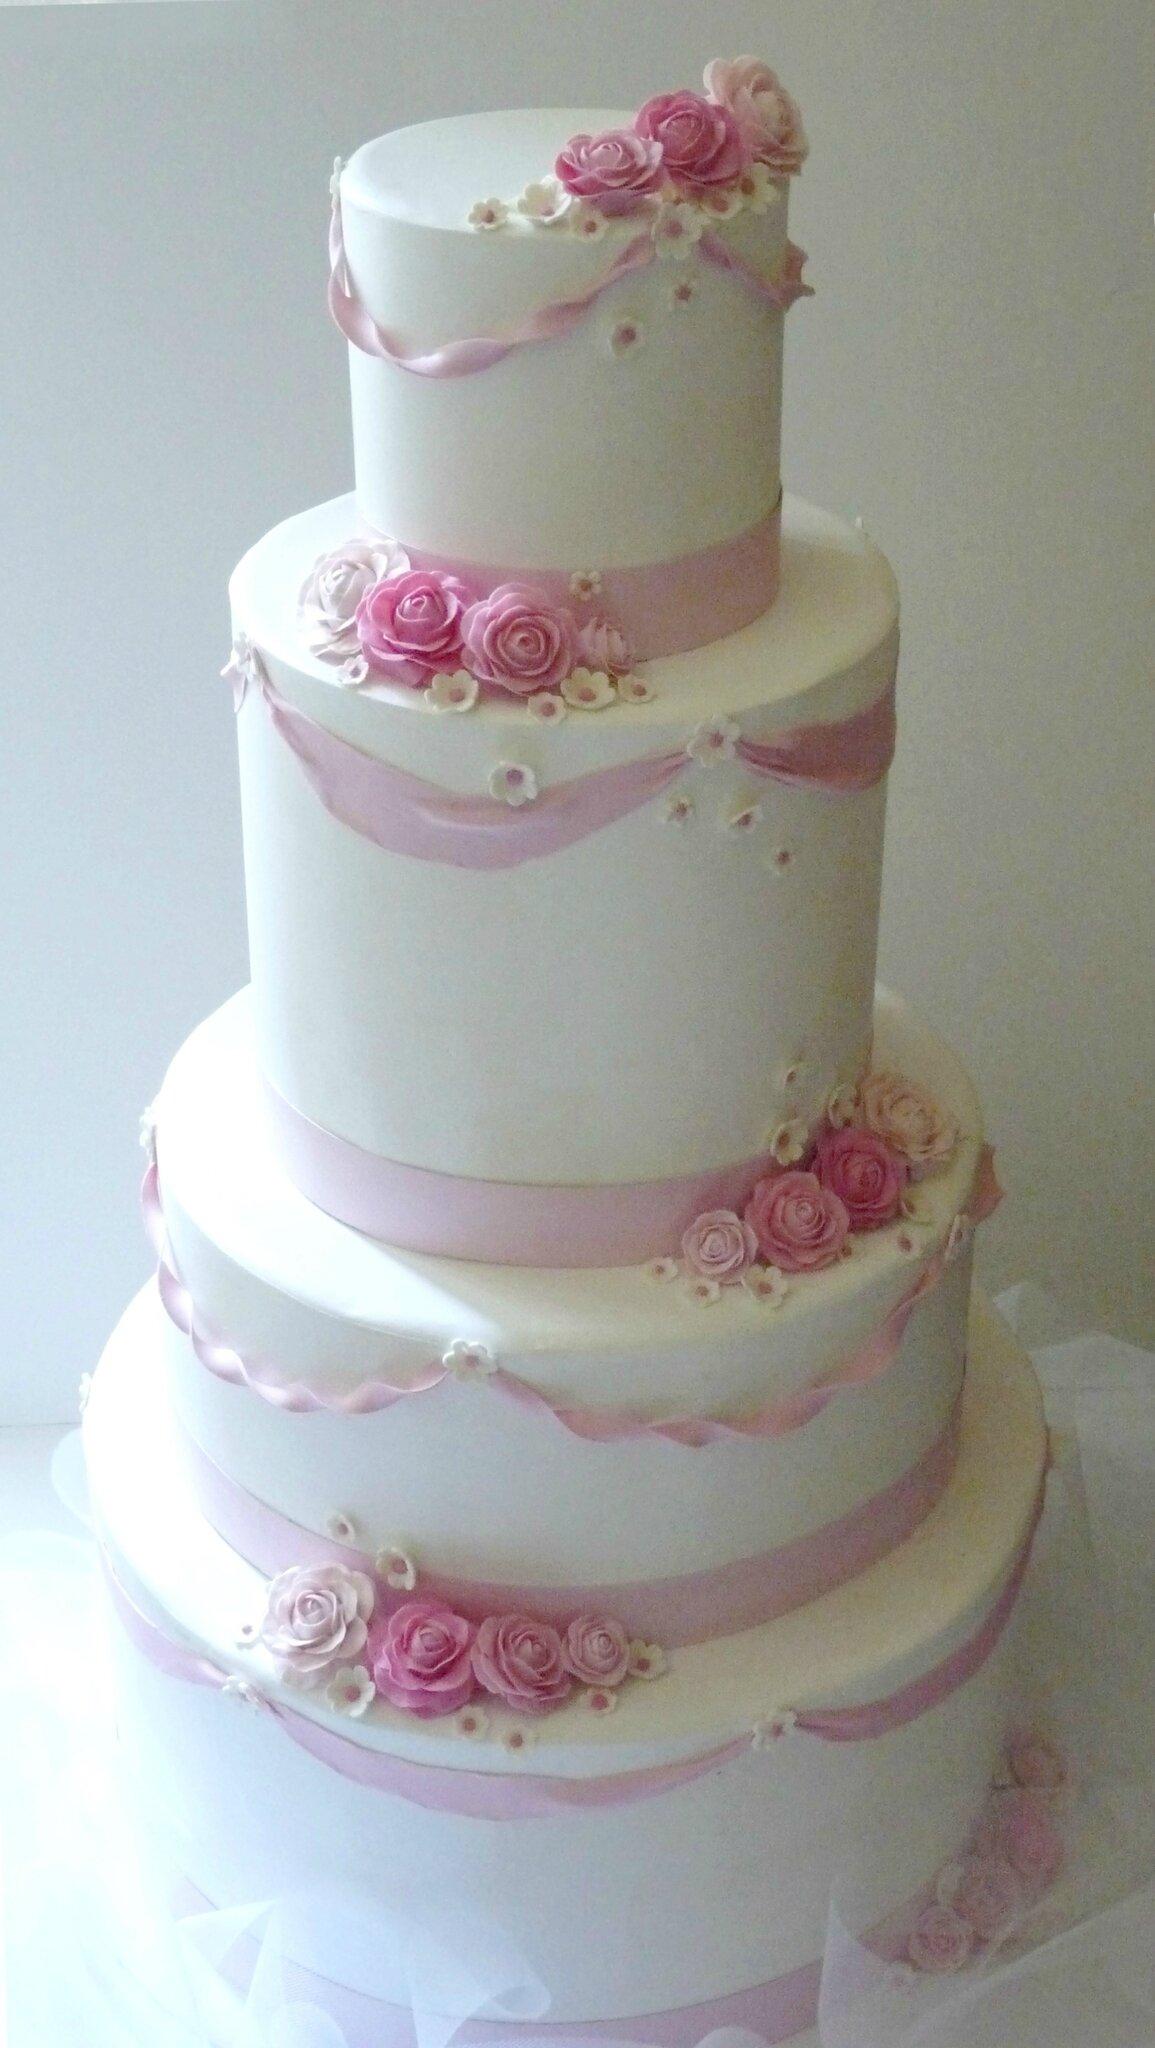 Wedding cake, diamètre 55 cm, hauteur 95 cm